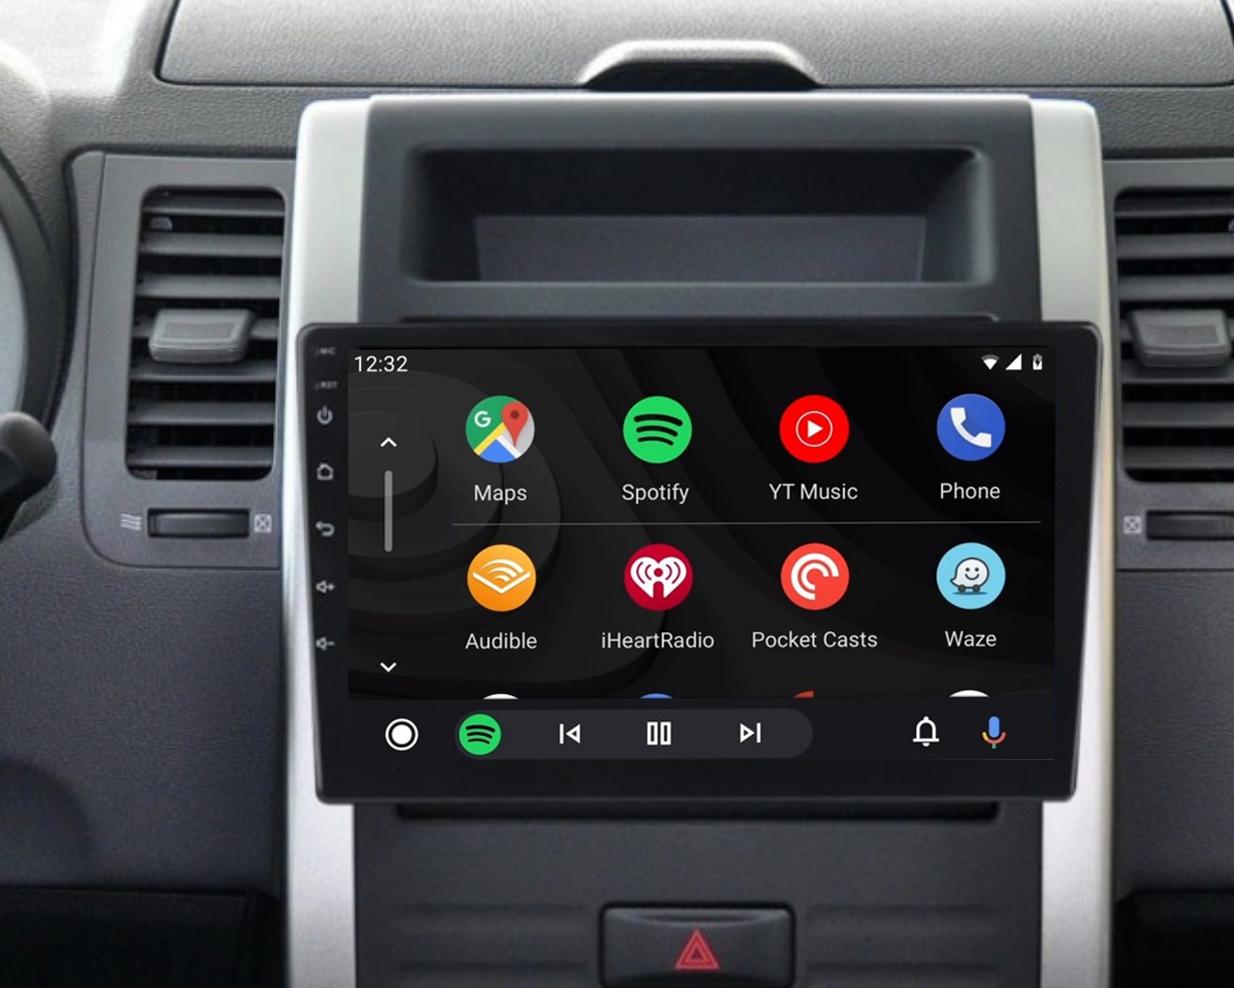 Ecran tactile QLED Android 11.0 + Apple Carplay sans fil Nissan X-Trail de 2007 à 2013